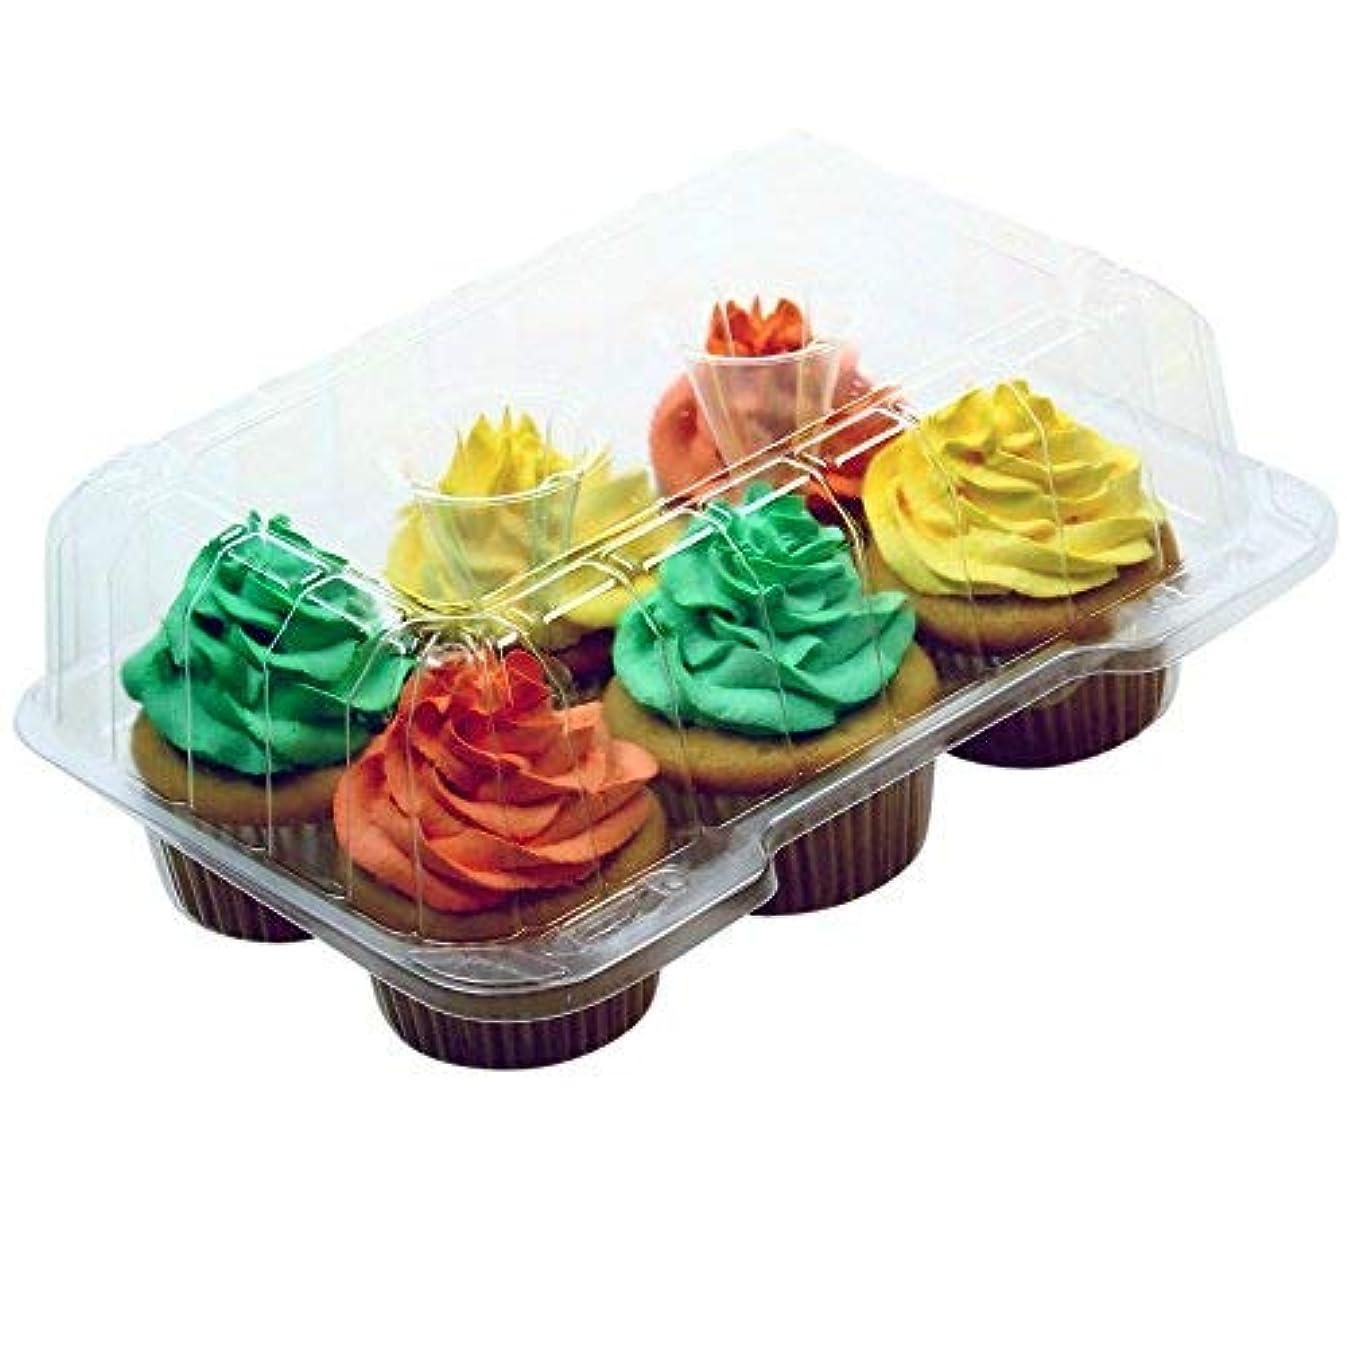 Premium Clear Cupcake Container Boxes - 4